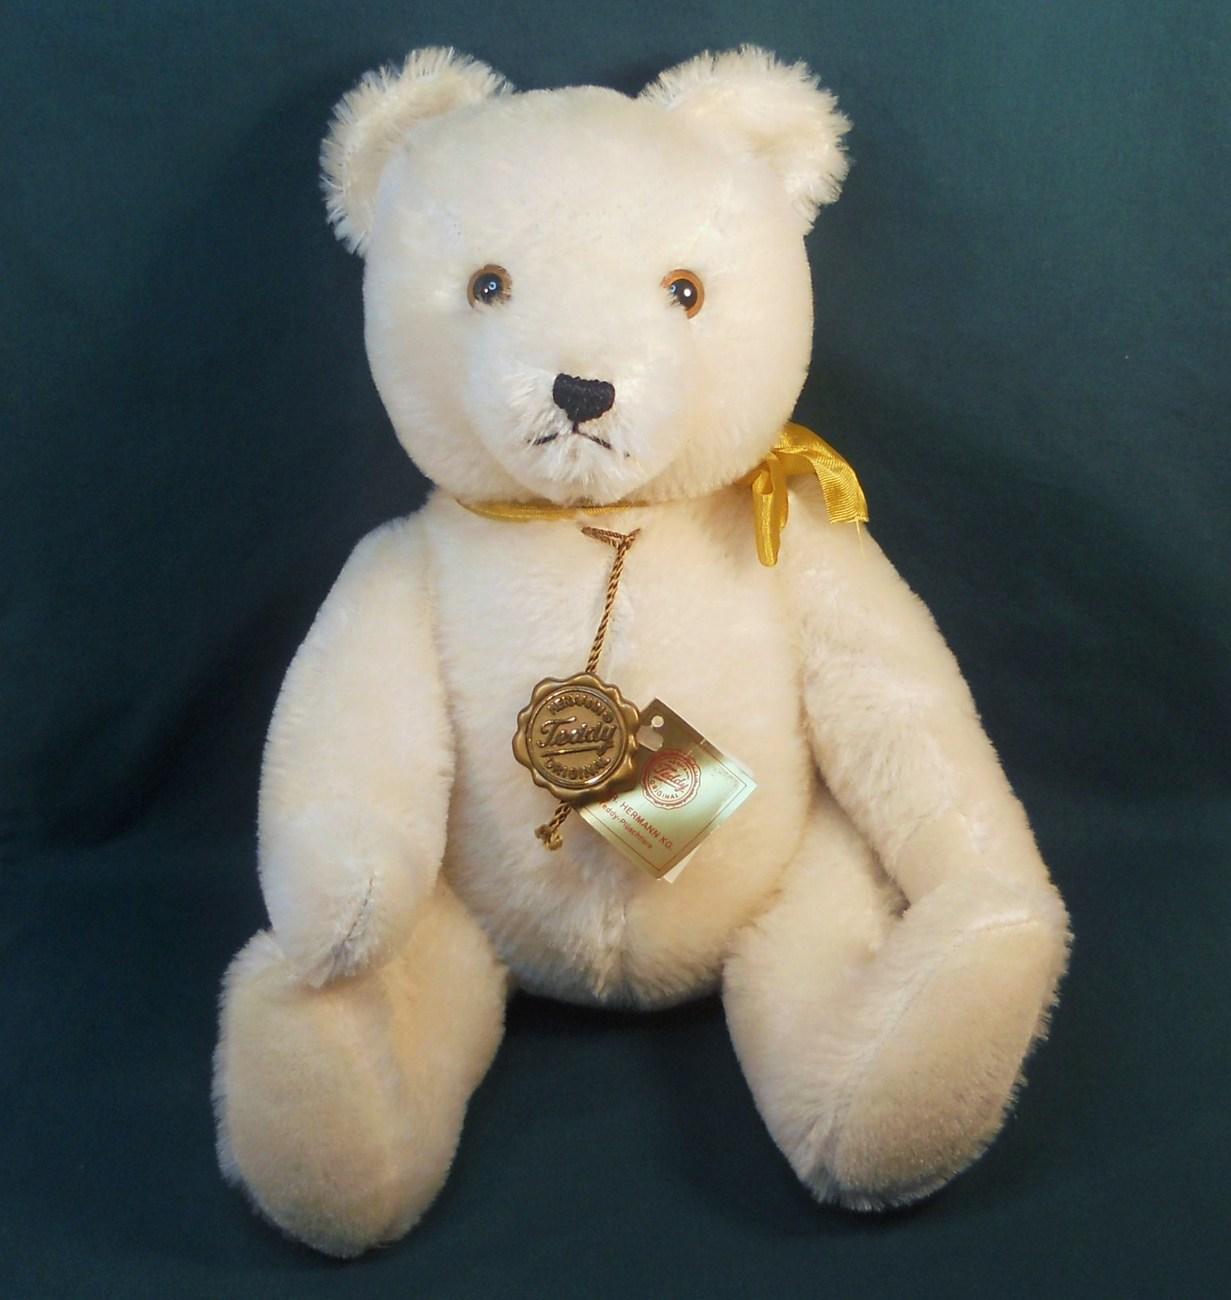 Hermann Original Teddy Bear 16 inch Exclusive P&E Rubin pre 1980